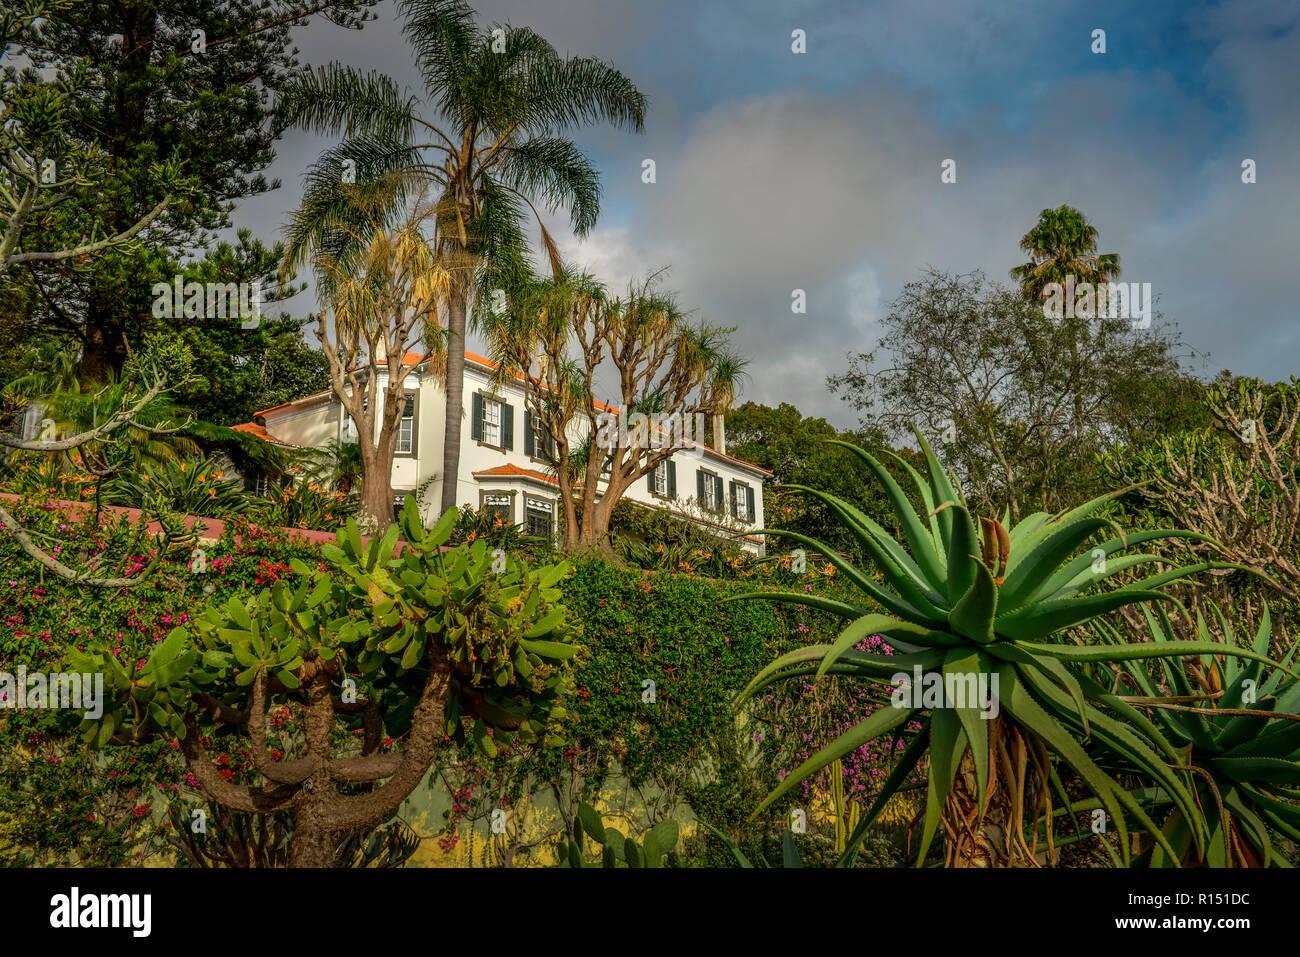 Herrenhaus, Botanischer Garten, Funchal, Madeira, Portugal Stock Photo